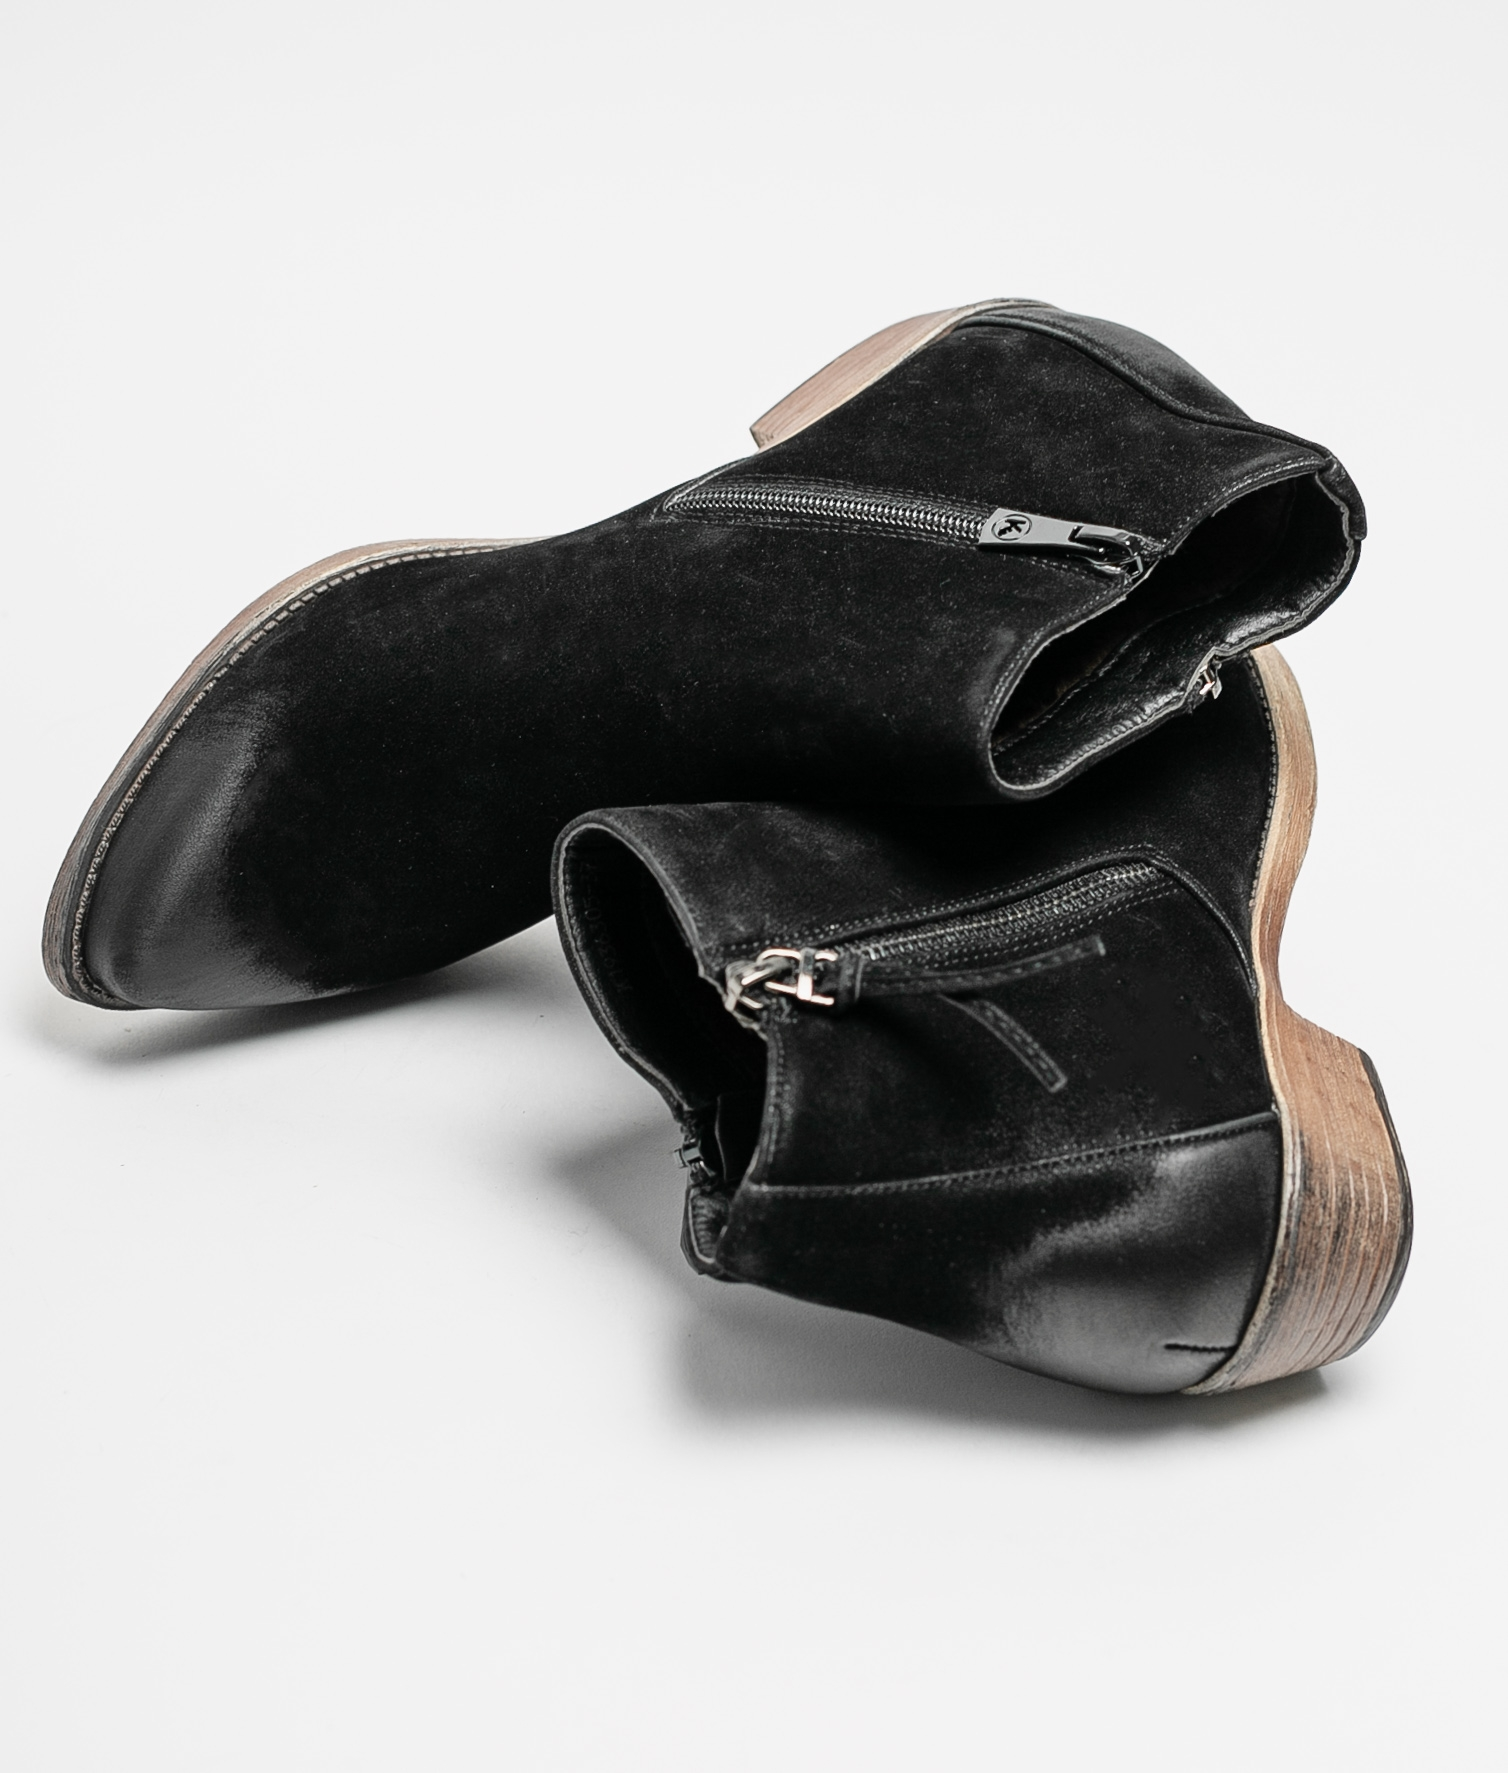 Cuvel Low Boot - Black